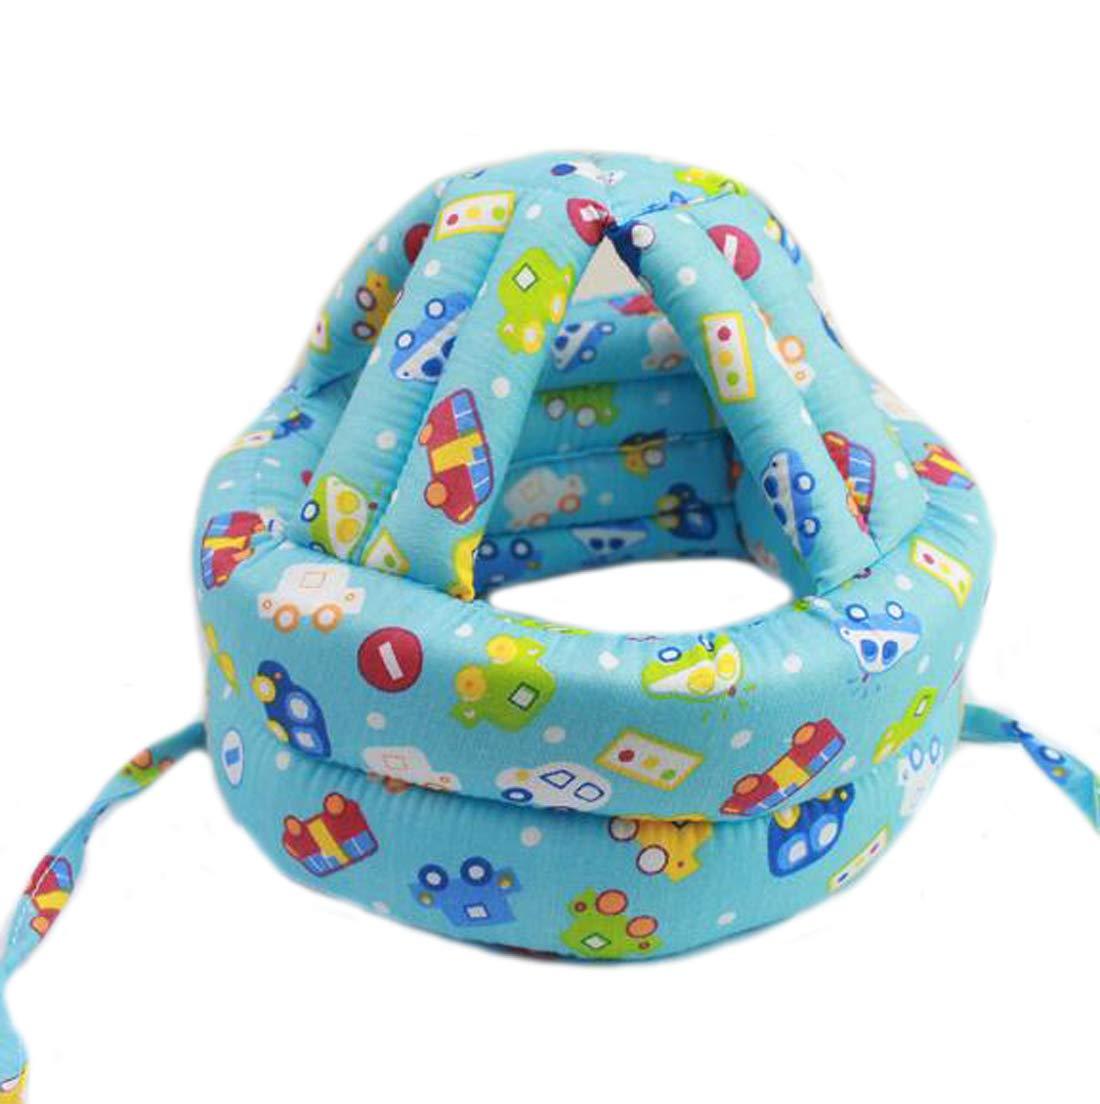 Ewanda store Toddler Infant Baby No Bumps Head Helmet Safety Helmet Children Headguard Head Cushion Bumper Bonnet,S,Blue Car